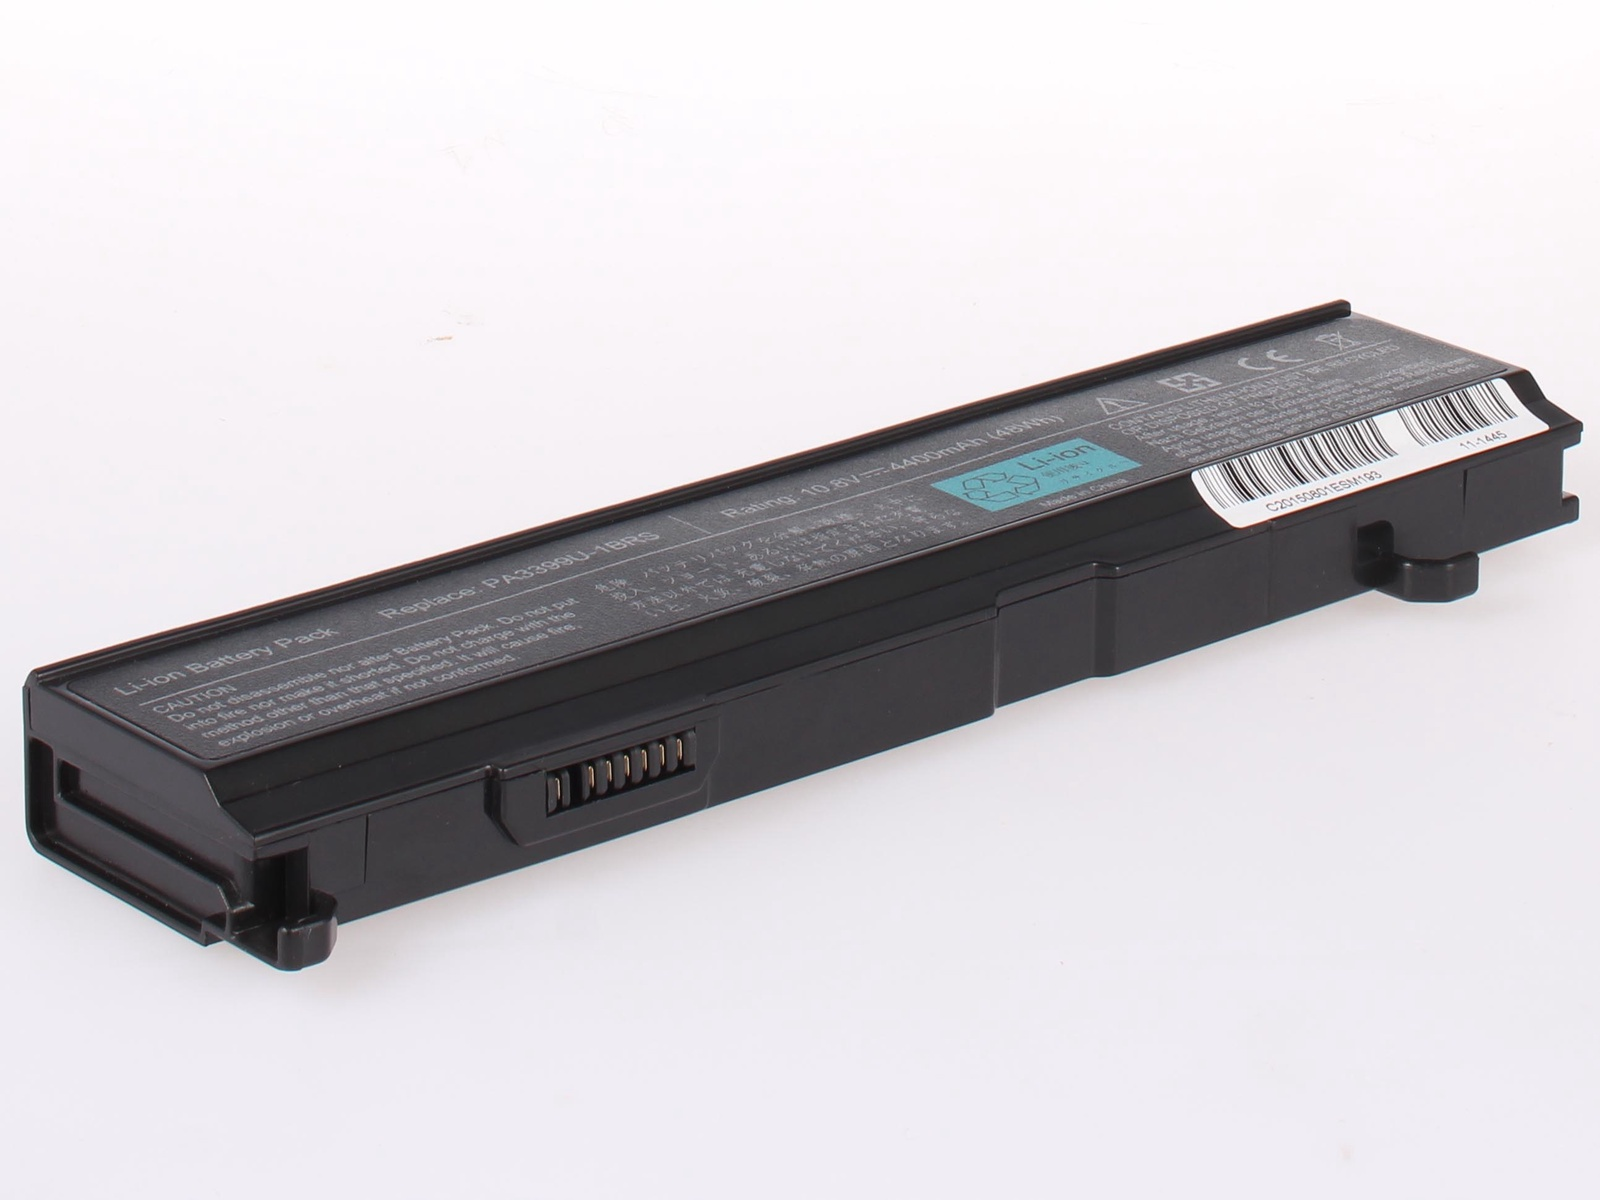 Аккумулятор для ноутбука AnyBatt для ToshiBa Satellite A100-036, Satellite M100-222, Satellite M45, Satellite A100-784, Satellite A100-011, Satellite M100-180, Satellite A135, Satellite A100-192, Satellite A105-S4034 цена